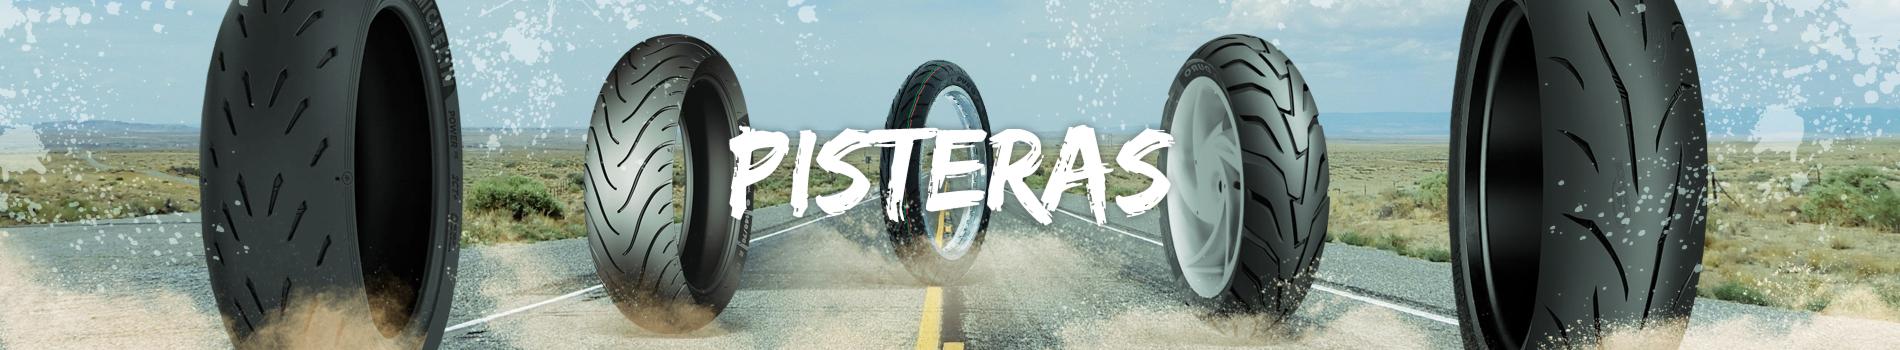 Pisteras